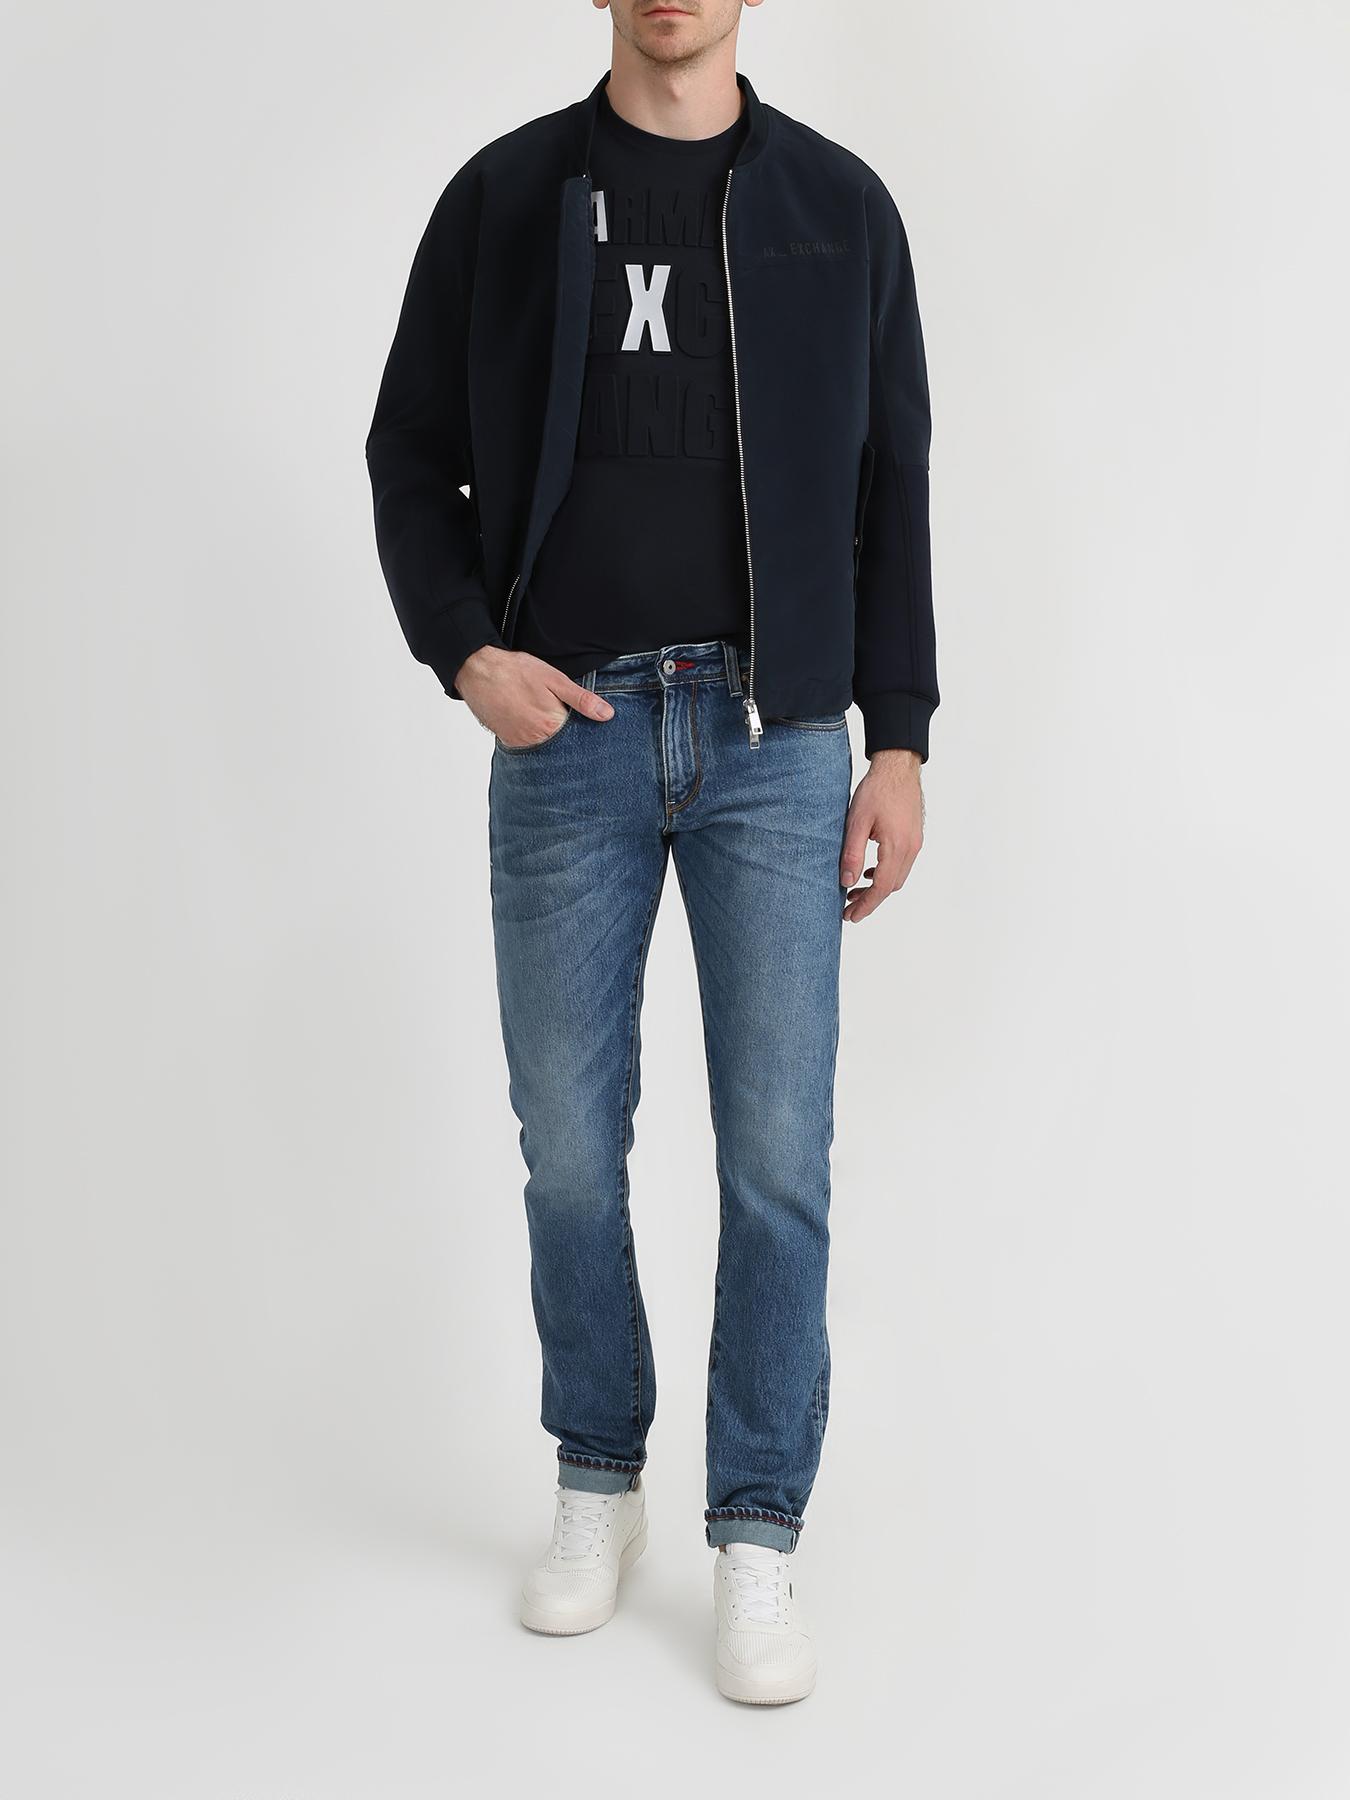 Куртка Armani Exchange Мужской бомбер